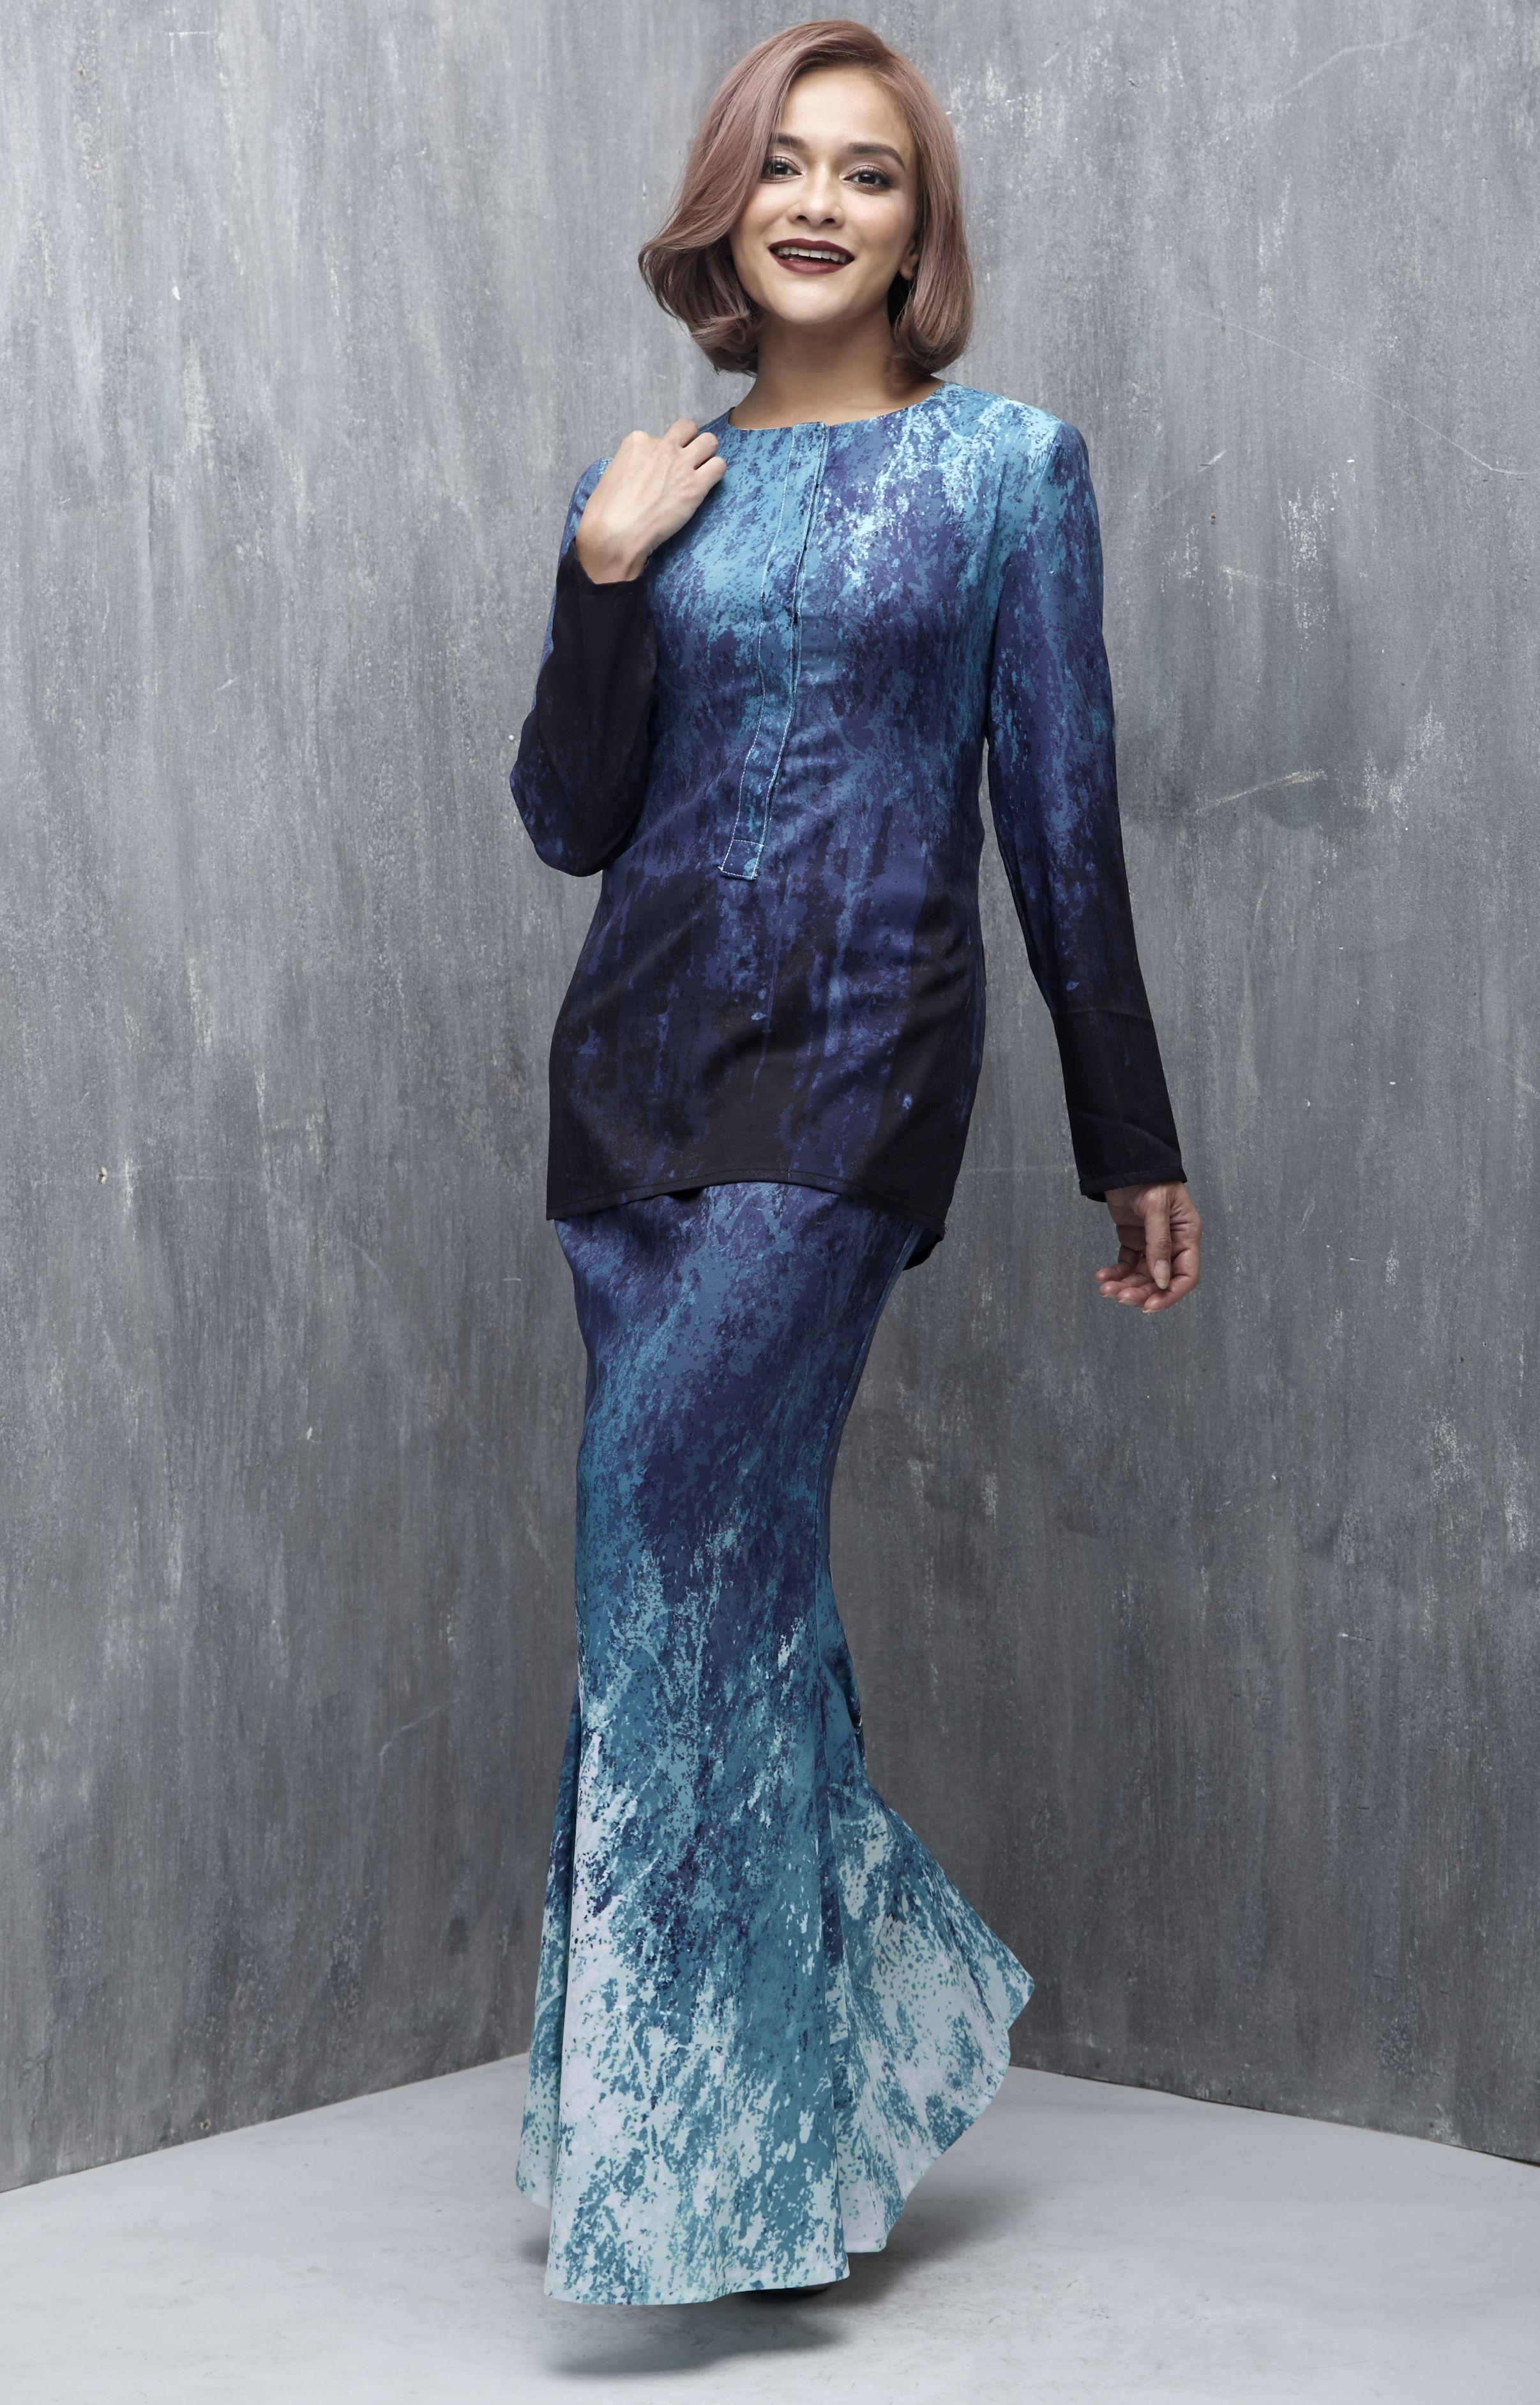 EMEL X SAZZY FALAK BLUE SEA STAR Exclusive Print Modern Baju Kurung Print